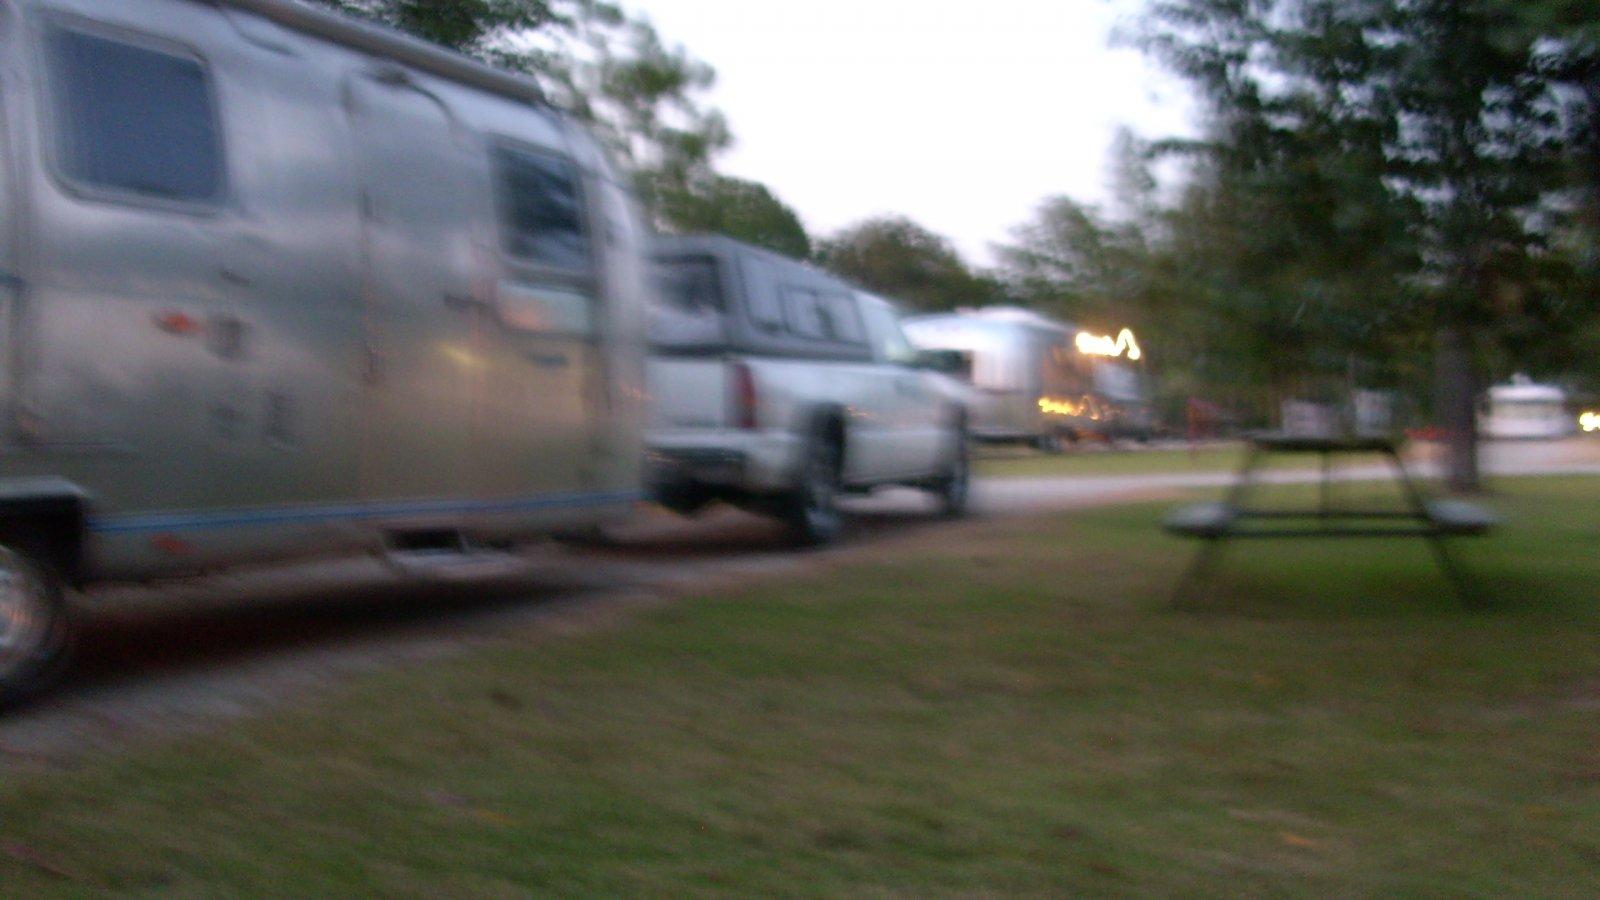 Click image for larger version  Name:Arkansas and Oklahoma 017.jpg Views:73 Size:150.1 KB ID:68594